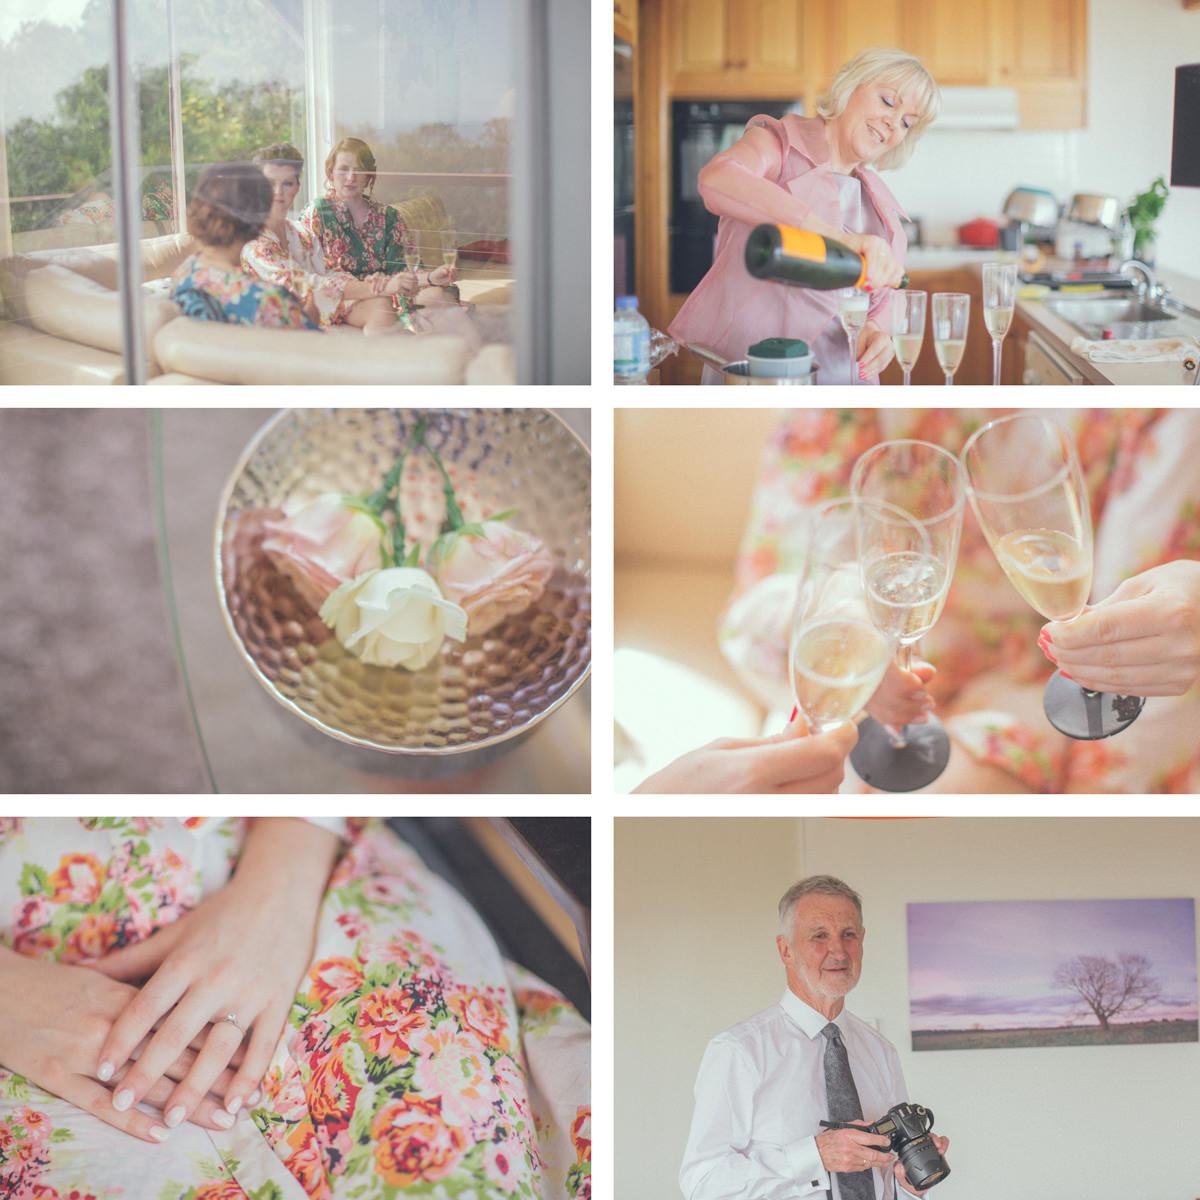 wedding photographer captures vintage inspired wedding in melbourne